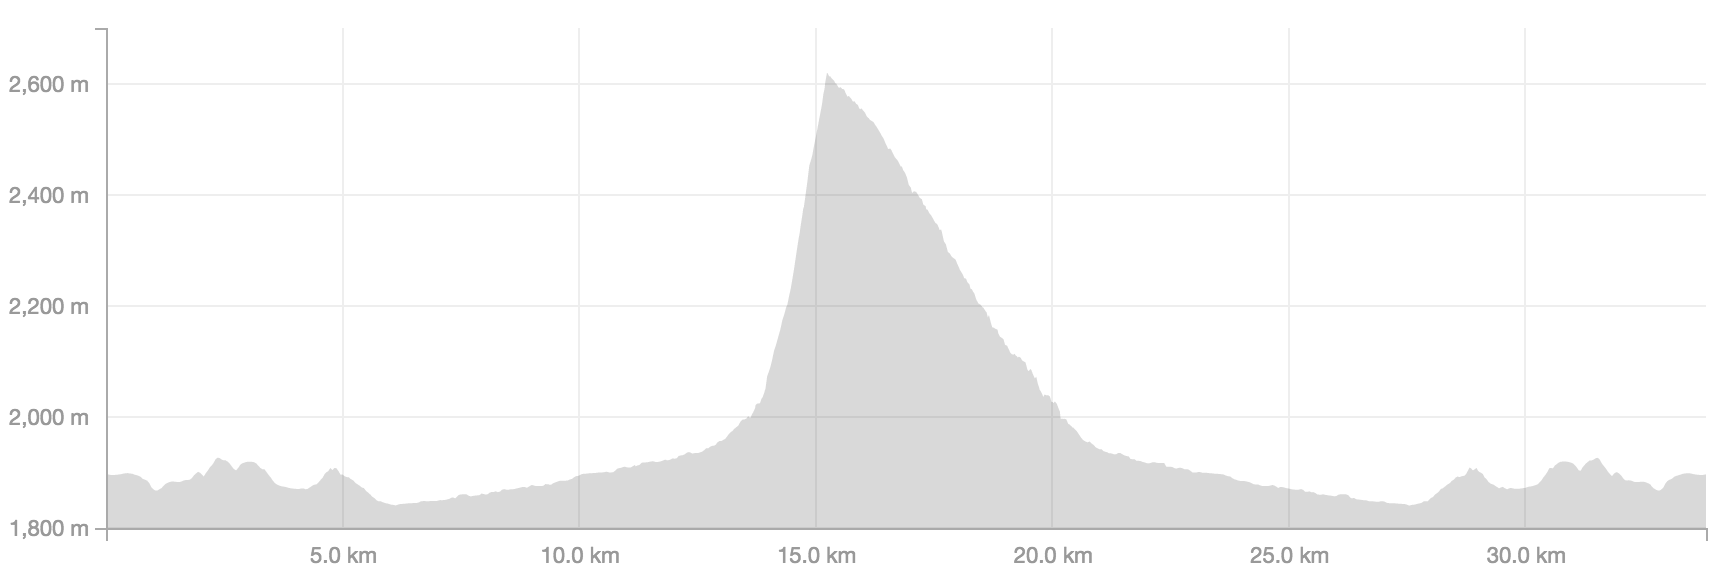 Shark-fin elevation profile